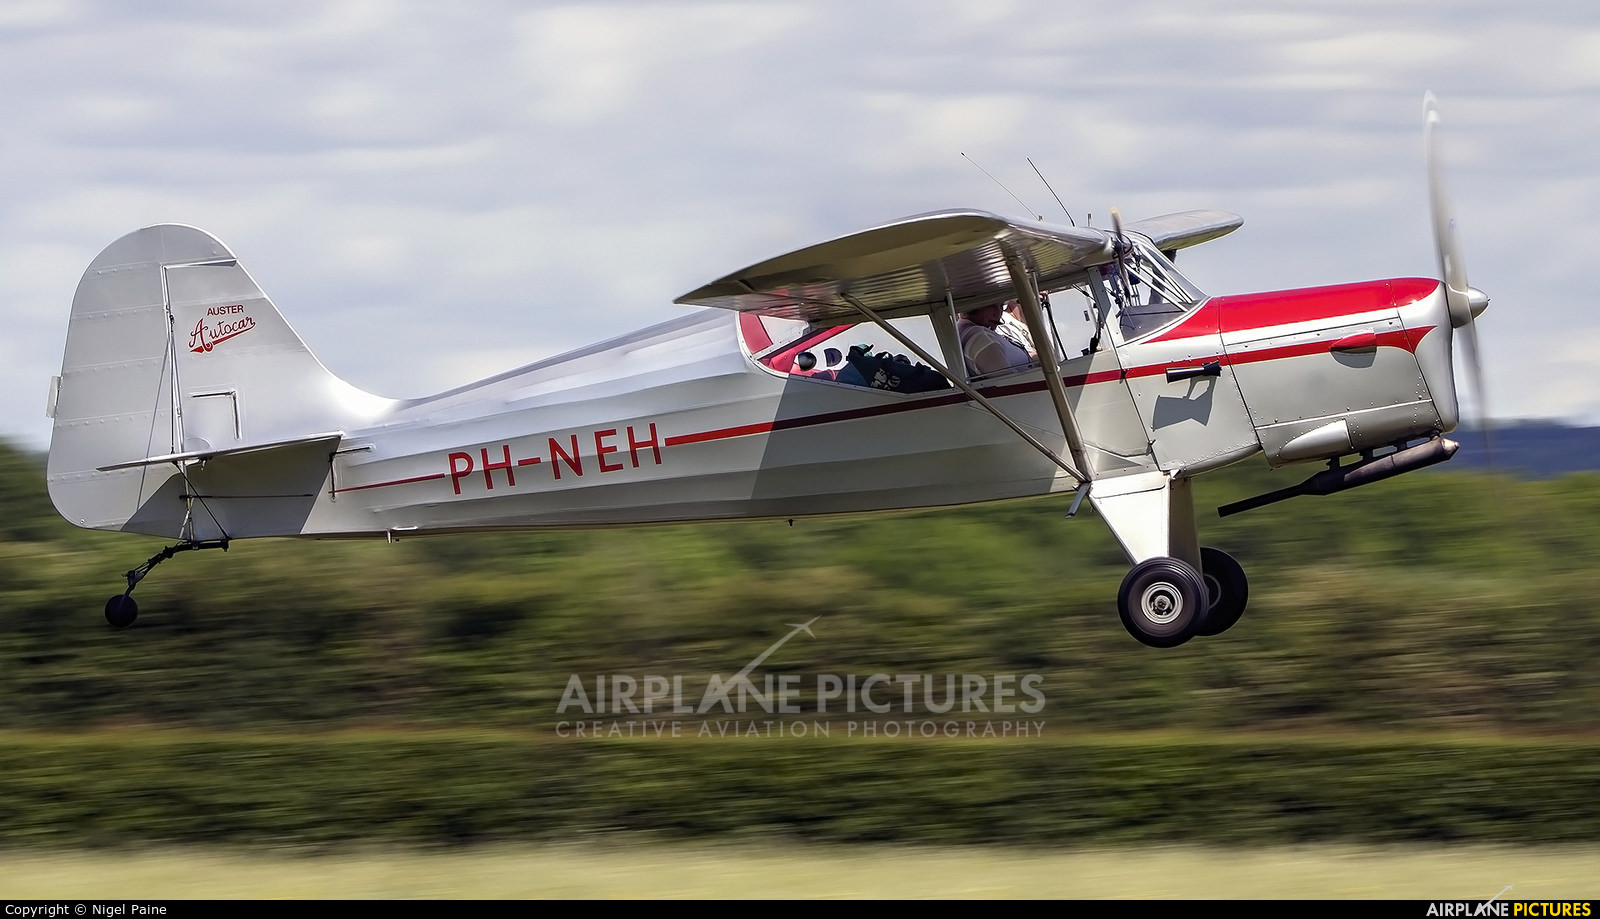 Private PH-NEH aircraft at Lashenden / Headcorn